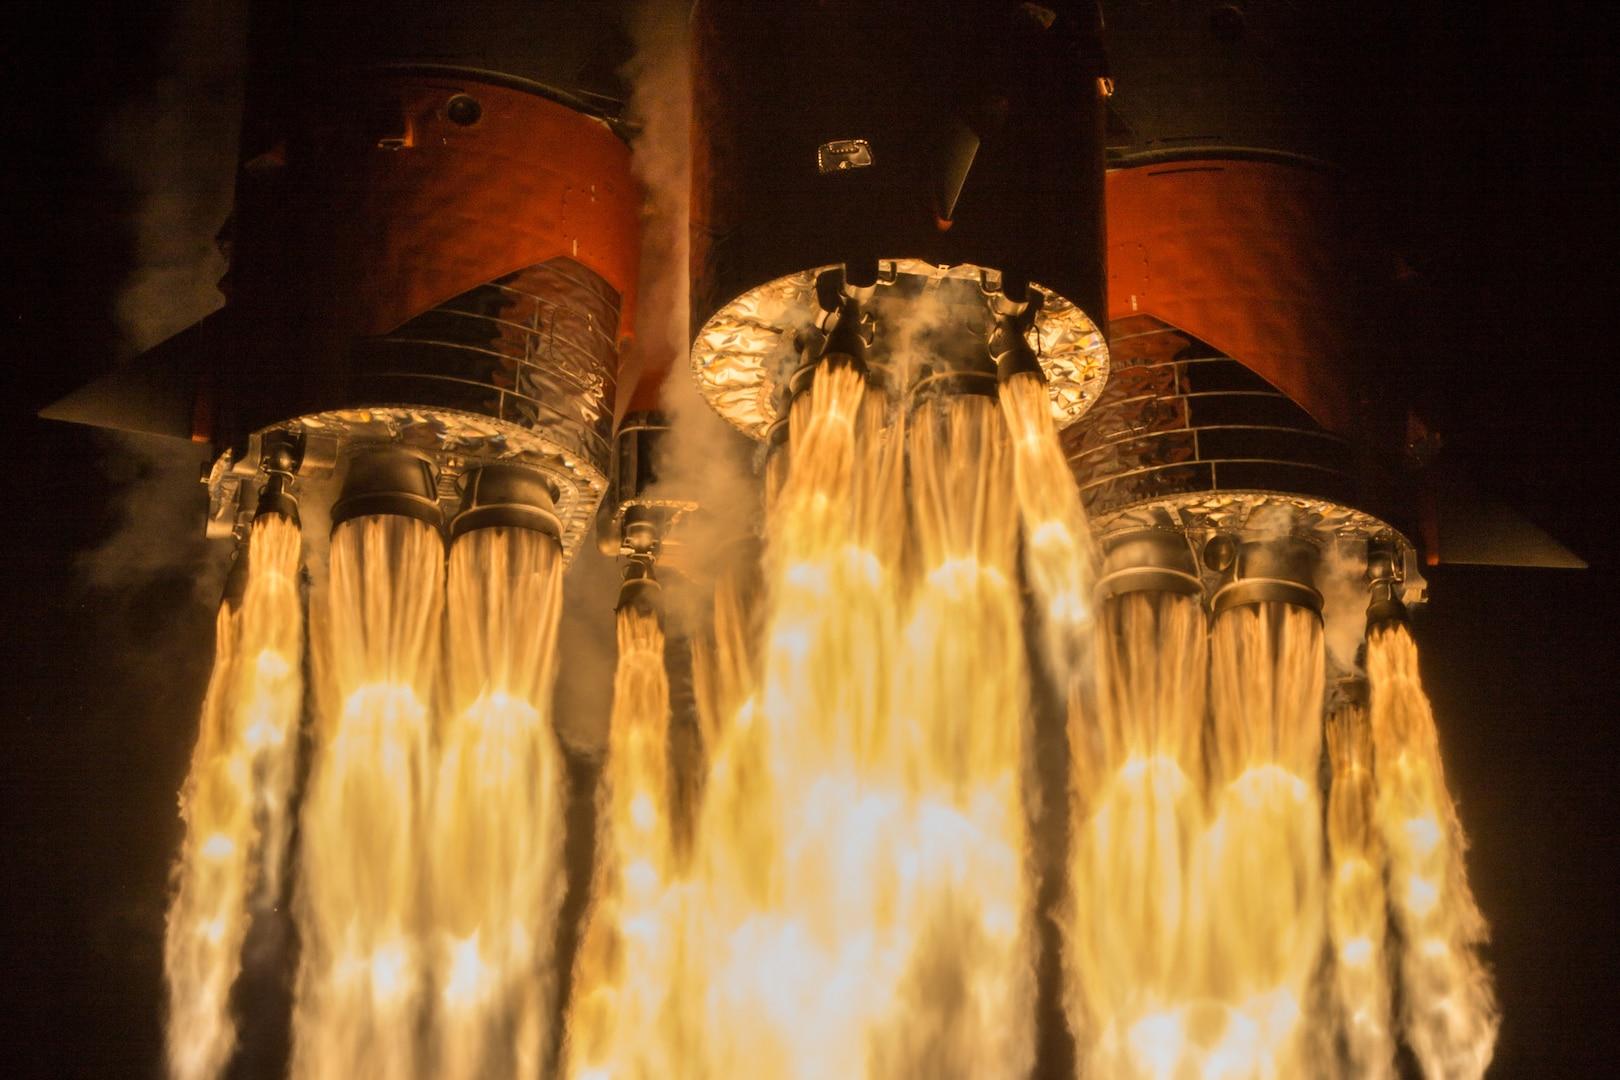 Soyuz-2.1b rocket lifts off from Baikonur Cosmodrome in Kazakhstan, together with 34 OneWeb communication satellites (Courtesy Roscosmos)